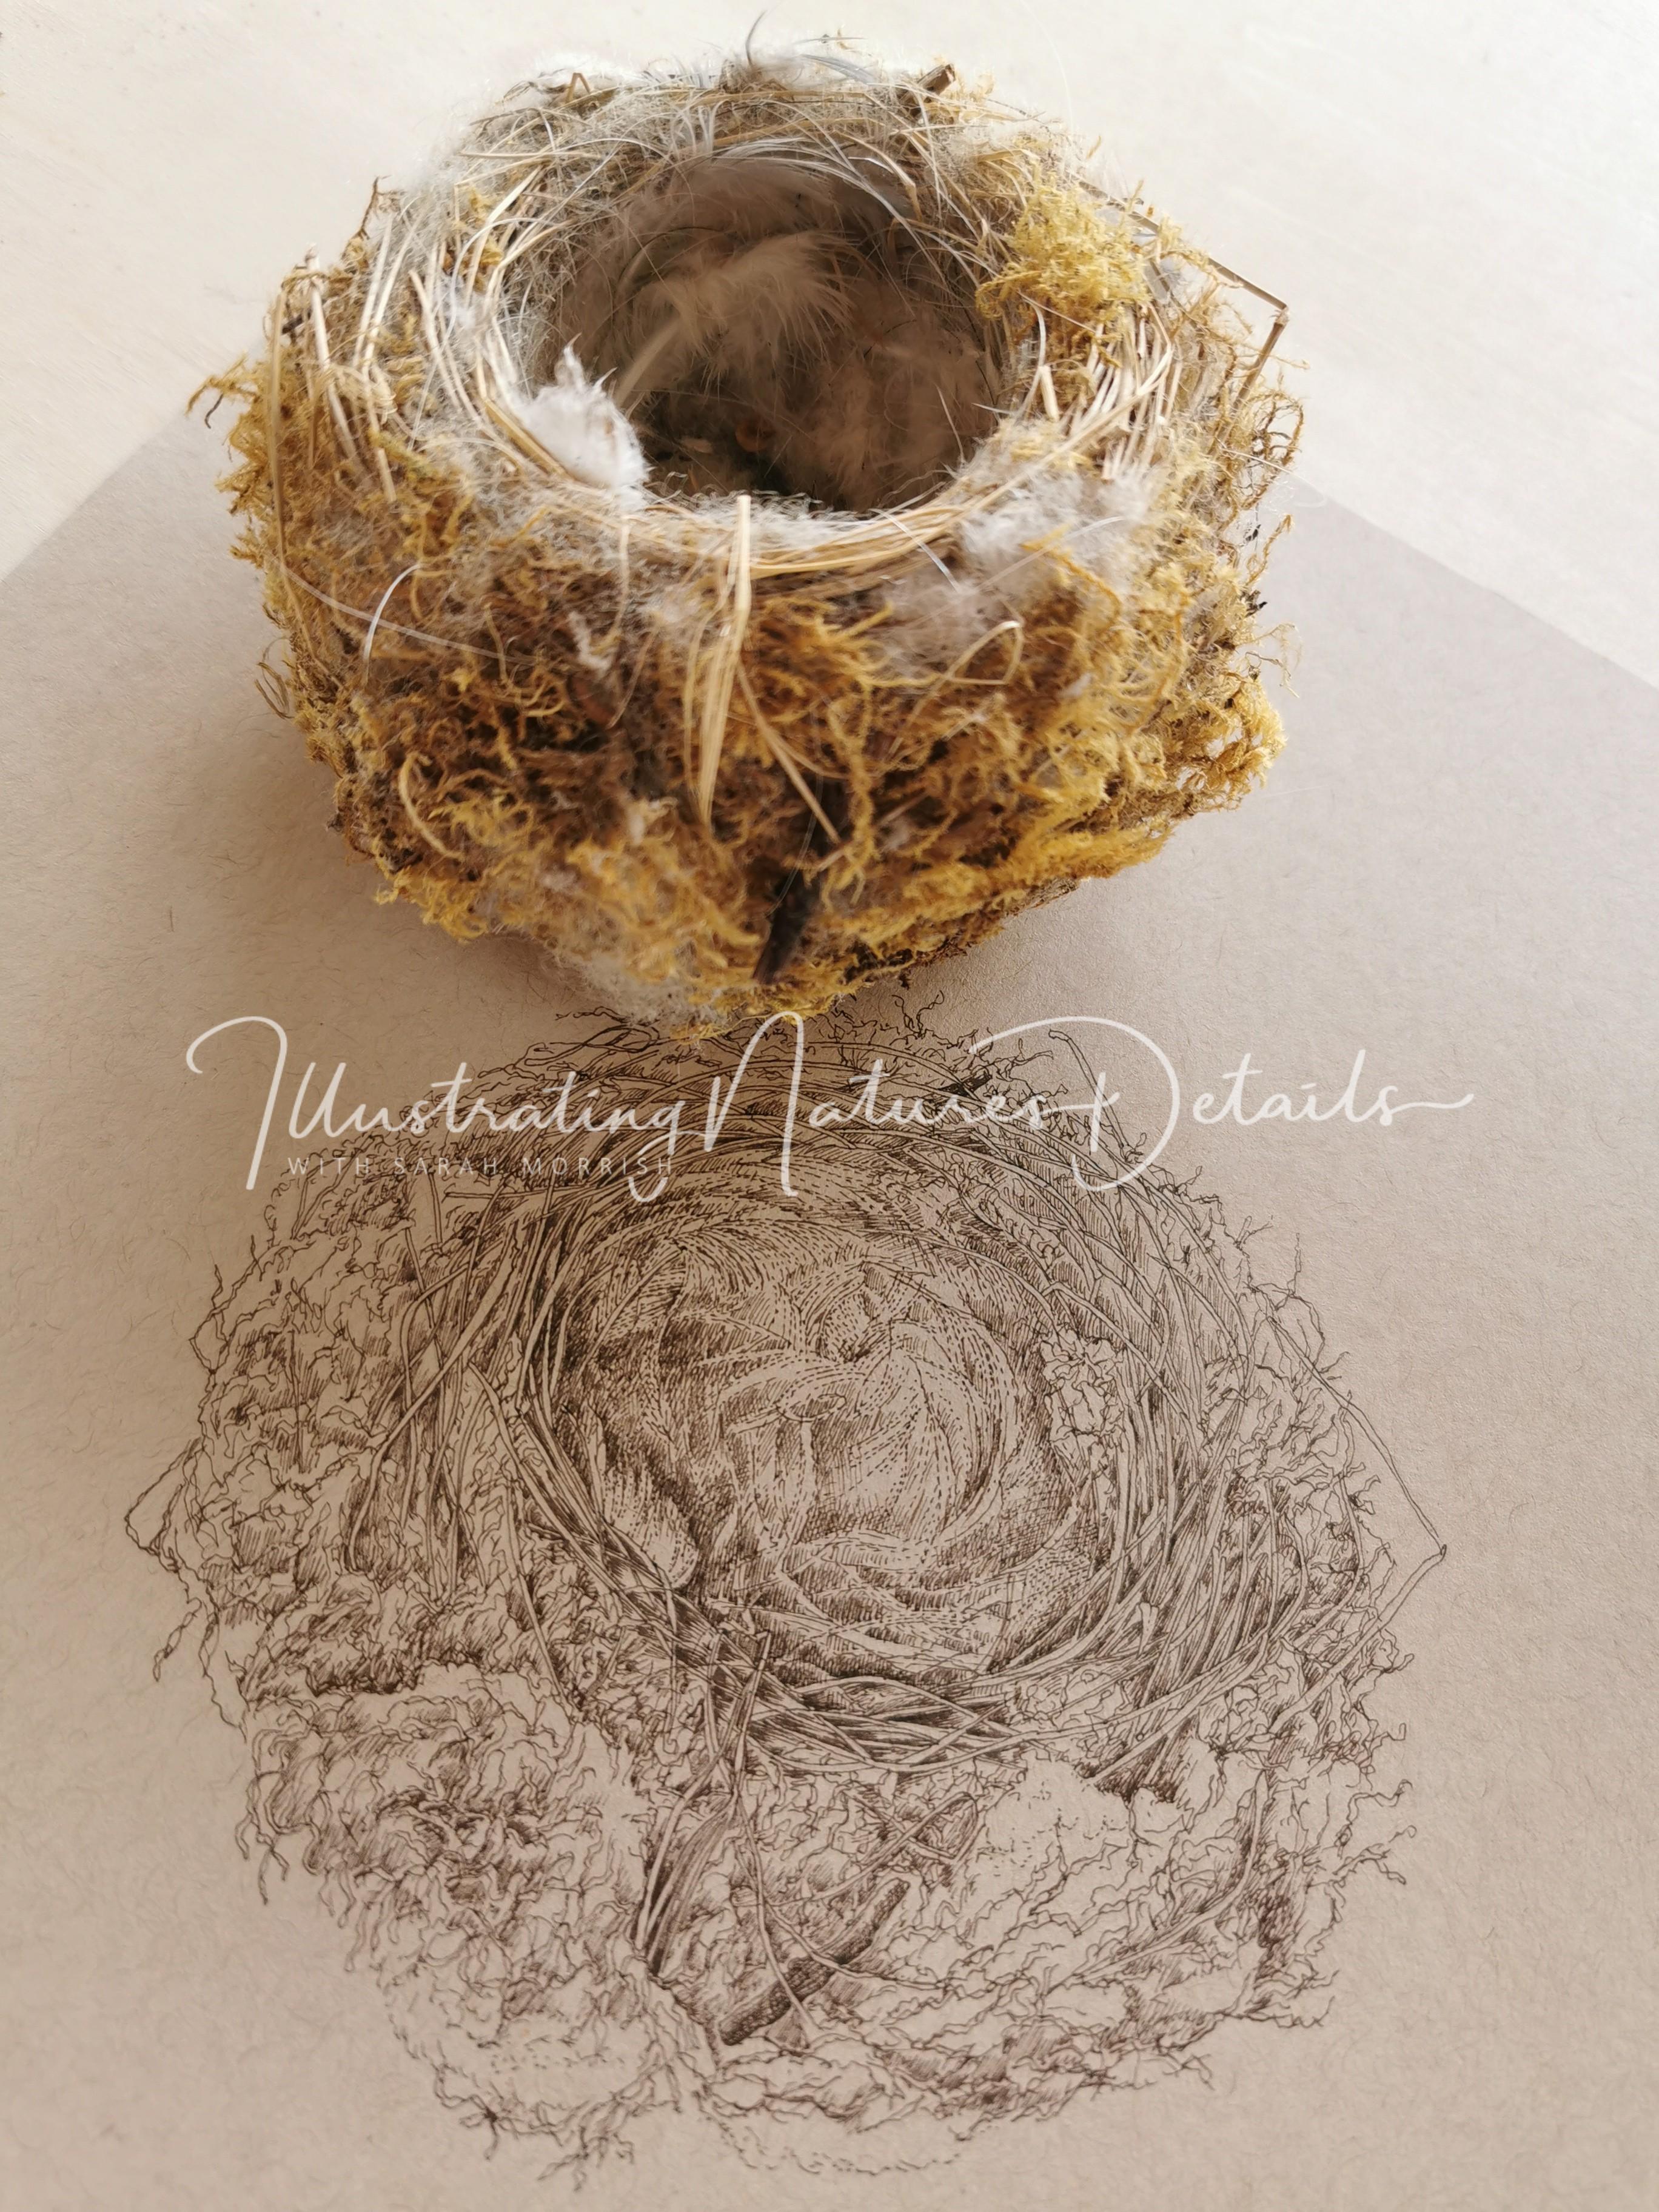 Blue tit's nest - sepia ink